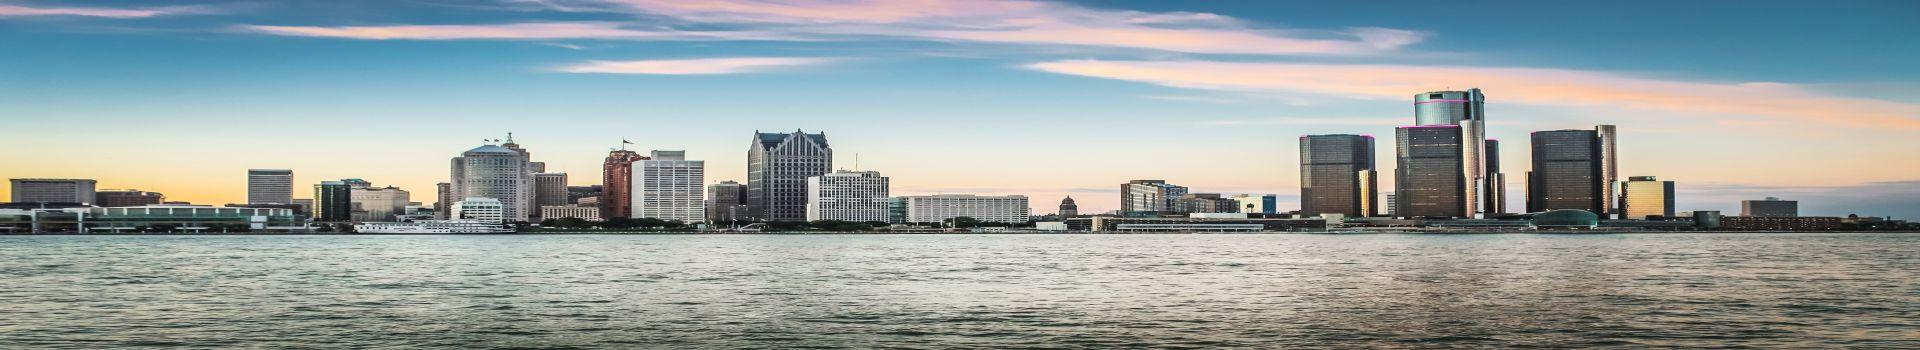 Detroit, MI Pana resized